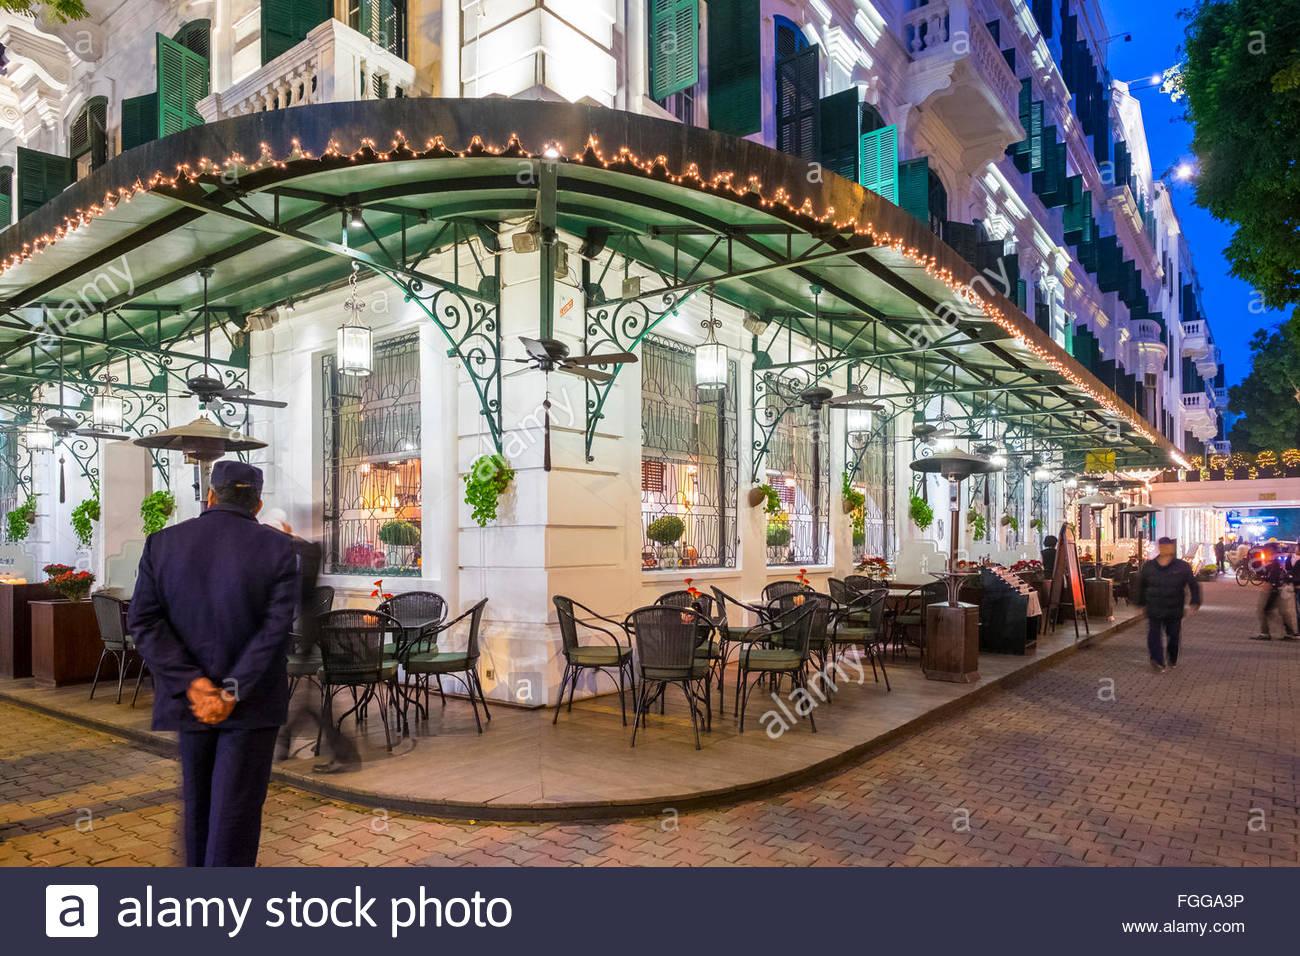 Sofitel Legend Metropole Hotel at night, Hanoi, Vietnam - Stock Image